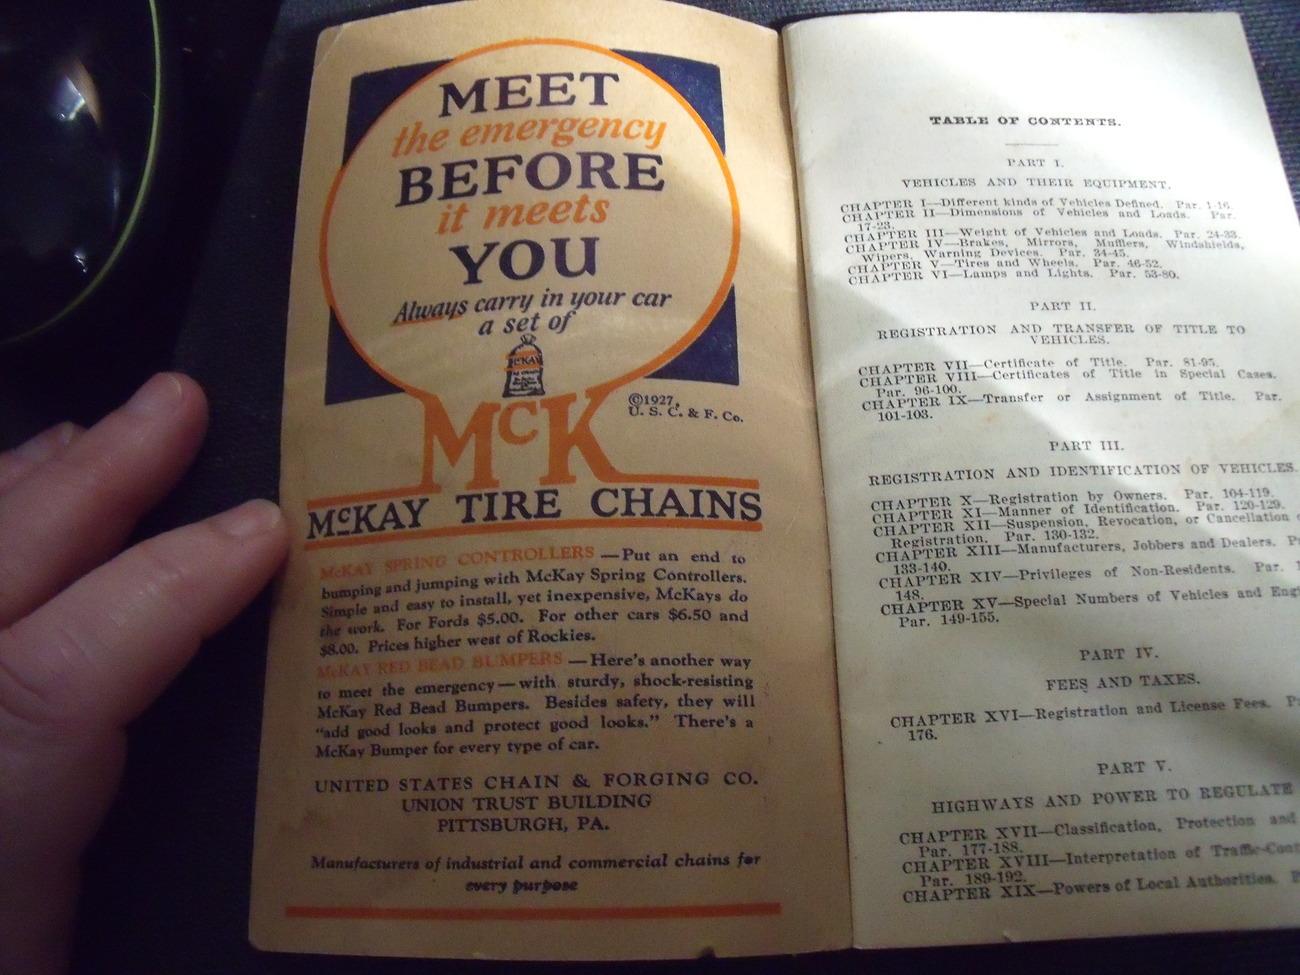 1927 Pennsylvania Motor Vehicle Code